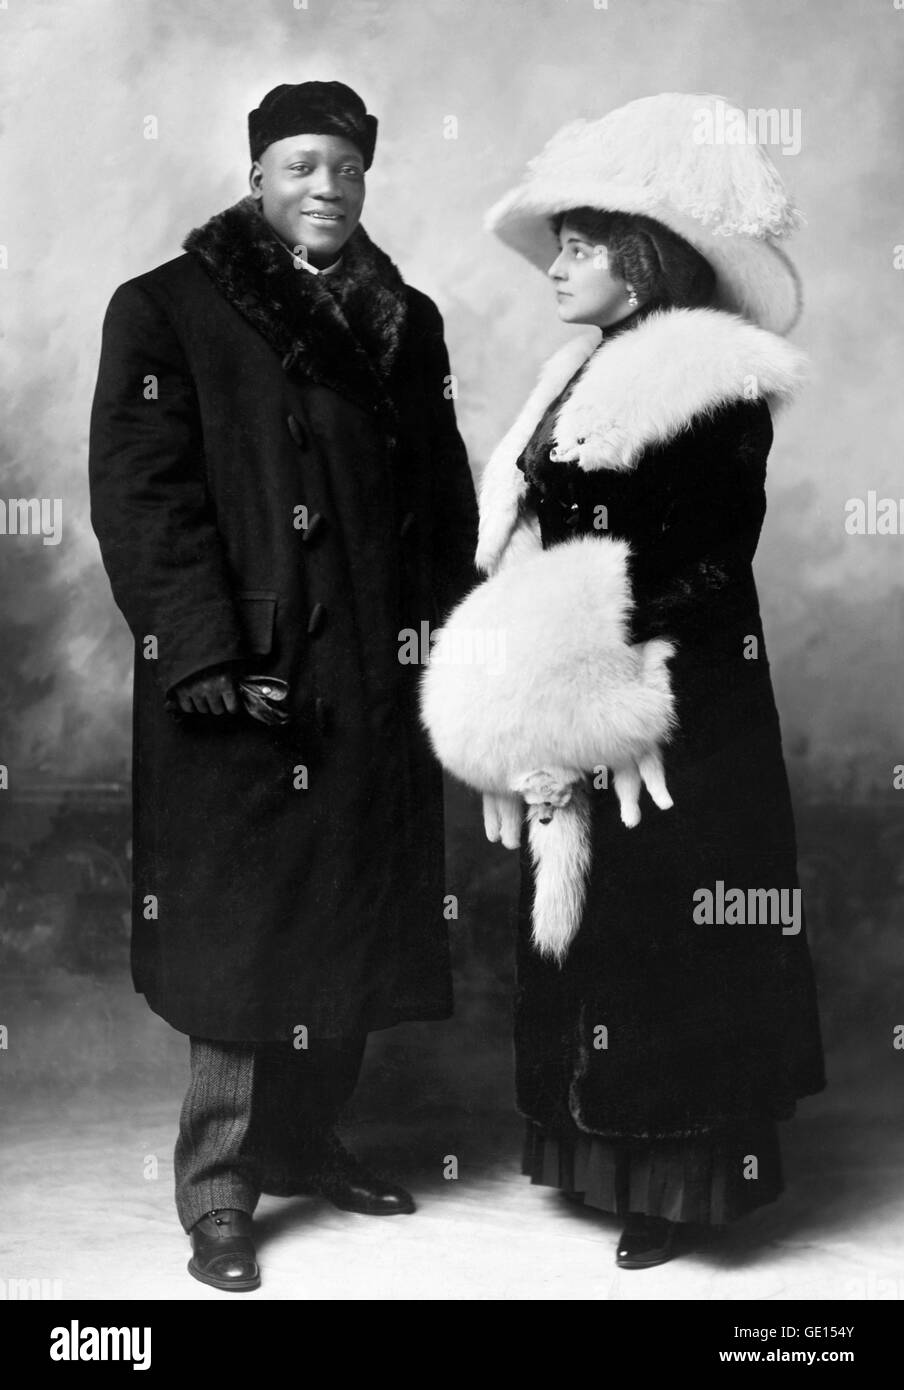 Jack Johnson, boxeador de peso pesado. Retrato de Juan Arthur 'Jack' Johnson (1878-1946), con su esposa Imagen De Stock